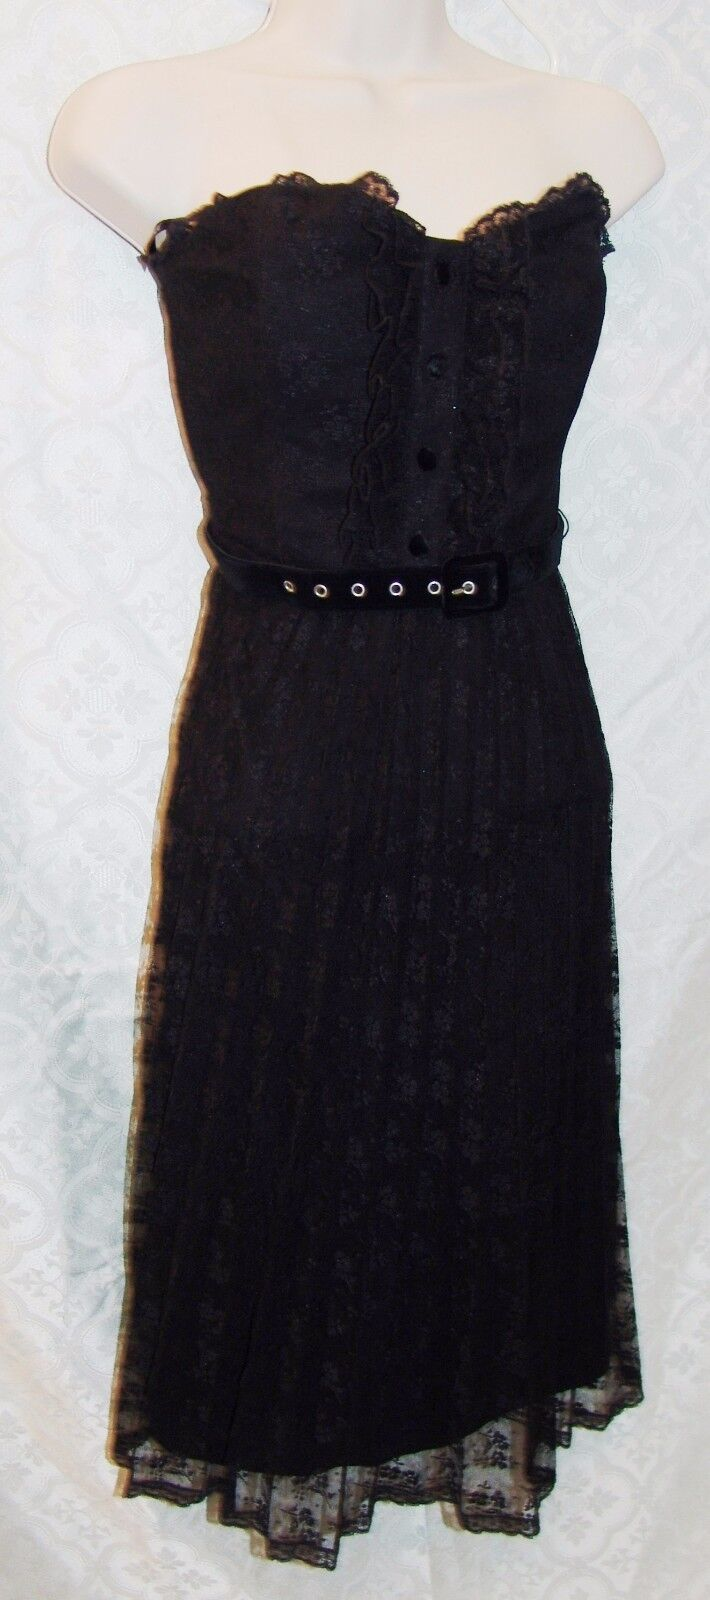 Betsey Johnson 6 schwarz Cocktail Dress Lace Lacey Bustier Punk Fit N Flare damen